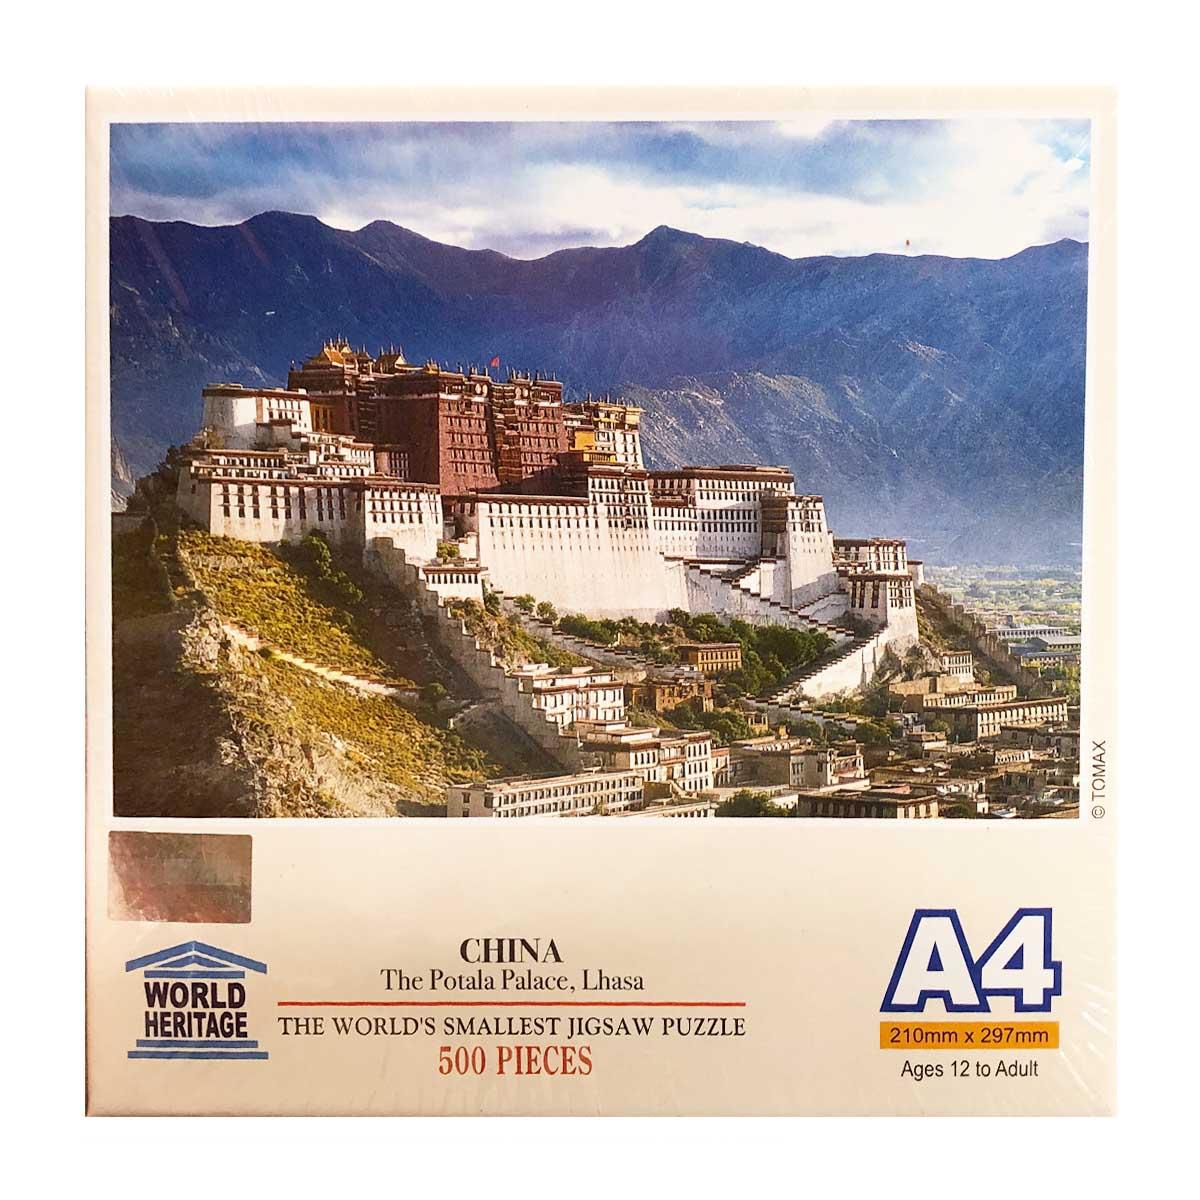 China: The Potala Palace Asia Jigsaw Puzzle